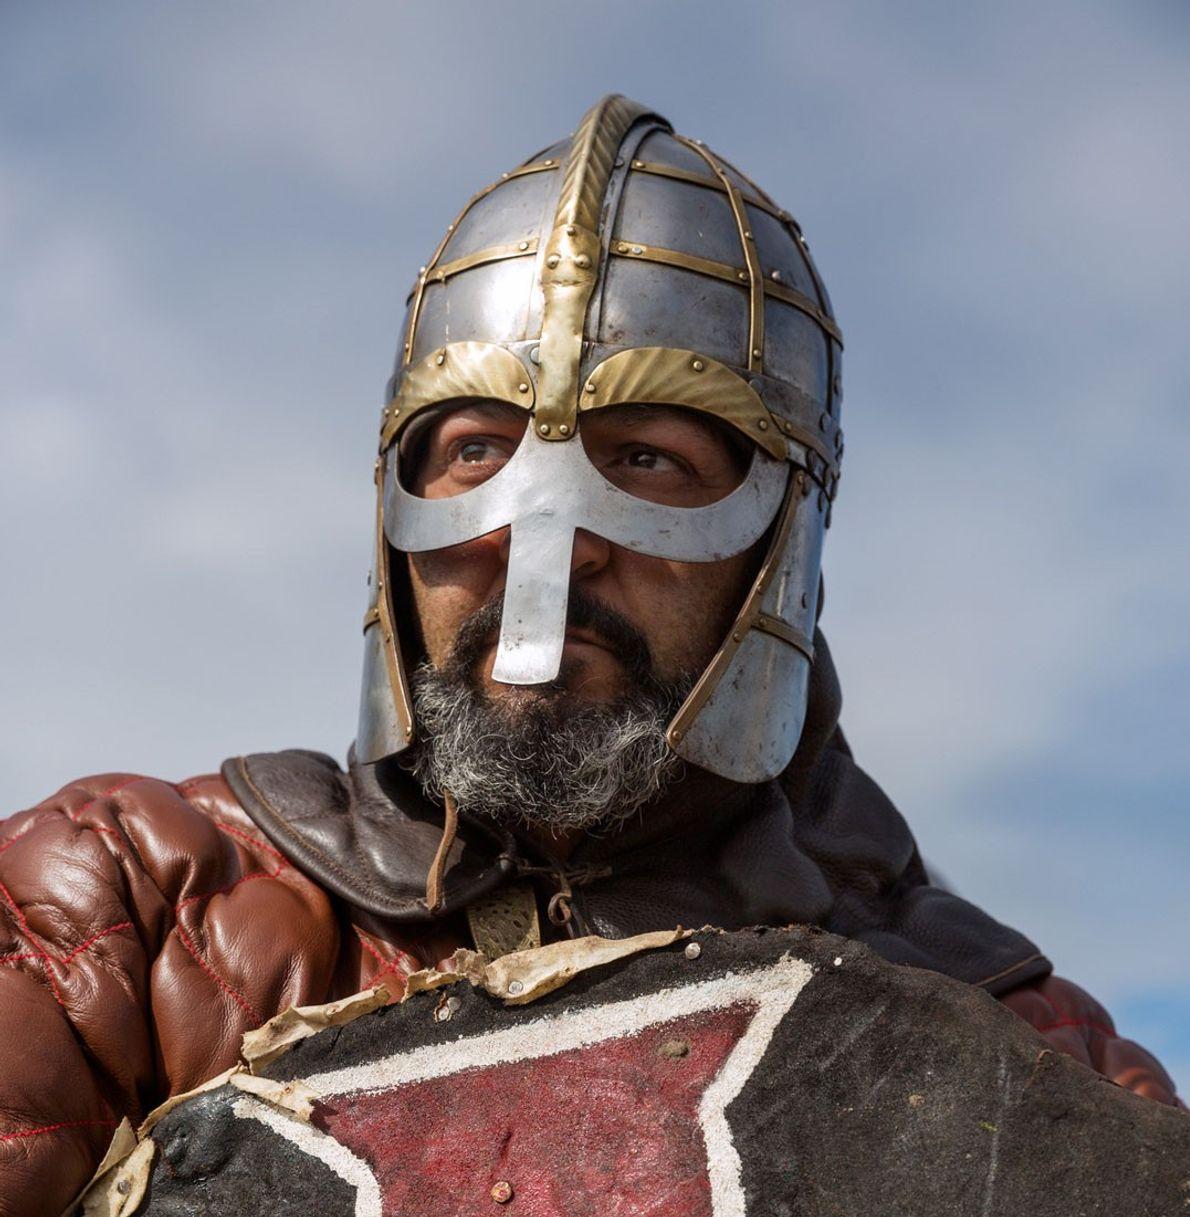 viking-galeria-de-fotos